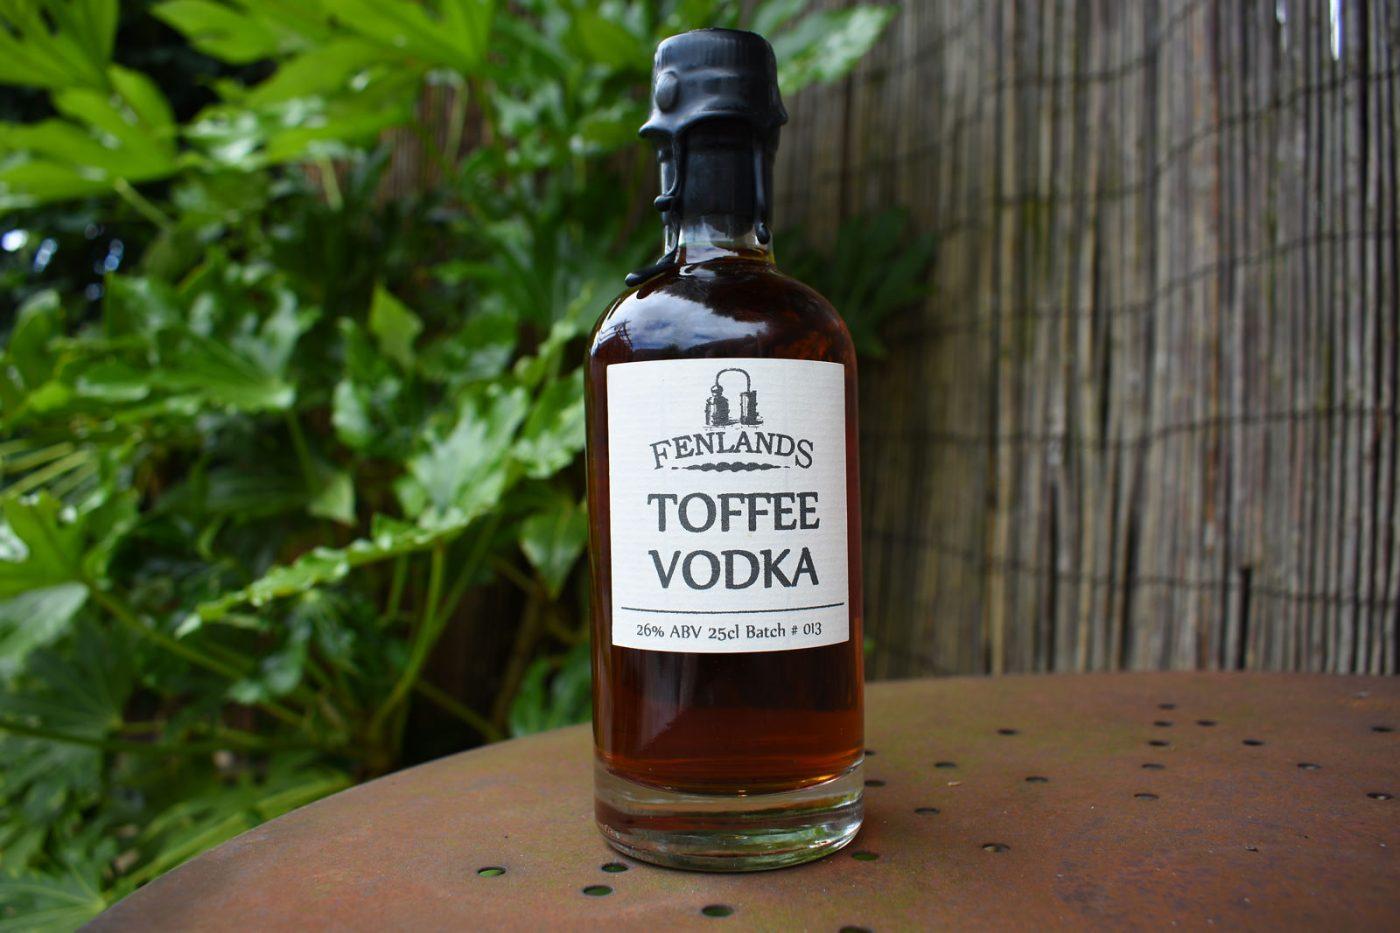 Fenlands Toffee Vodka